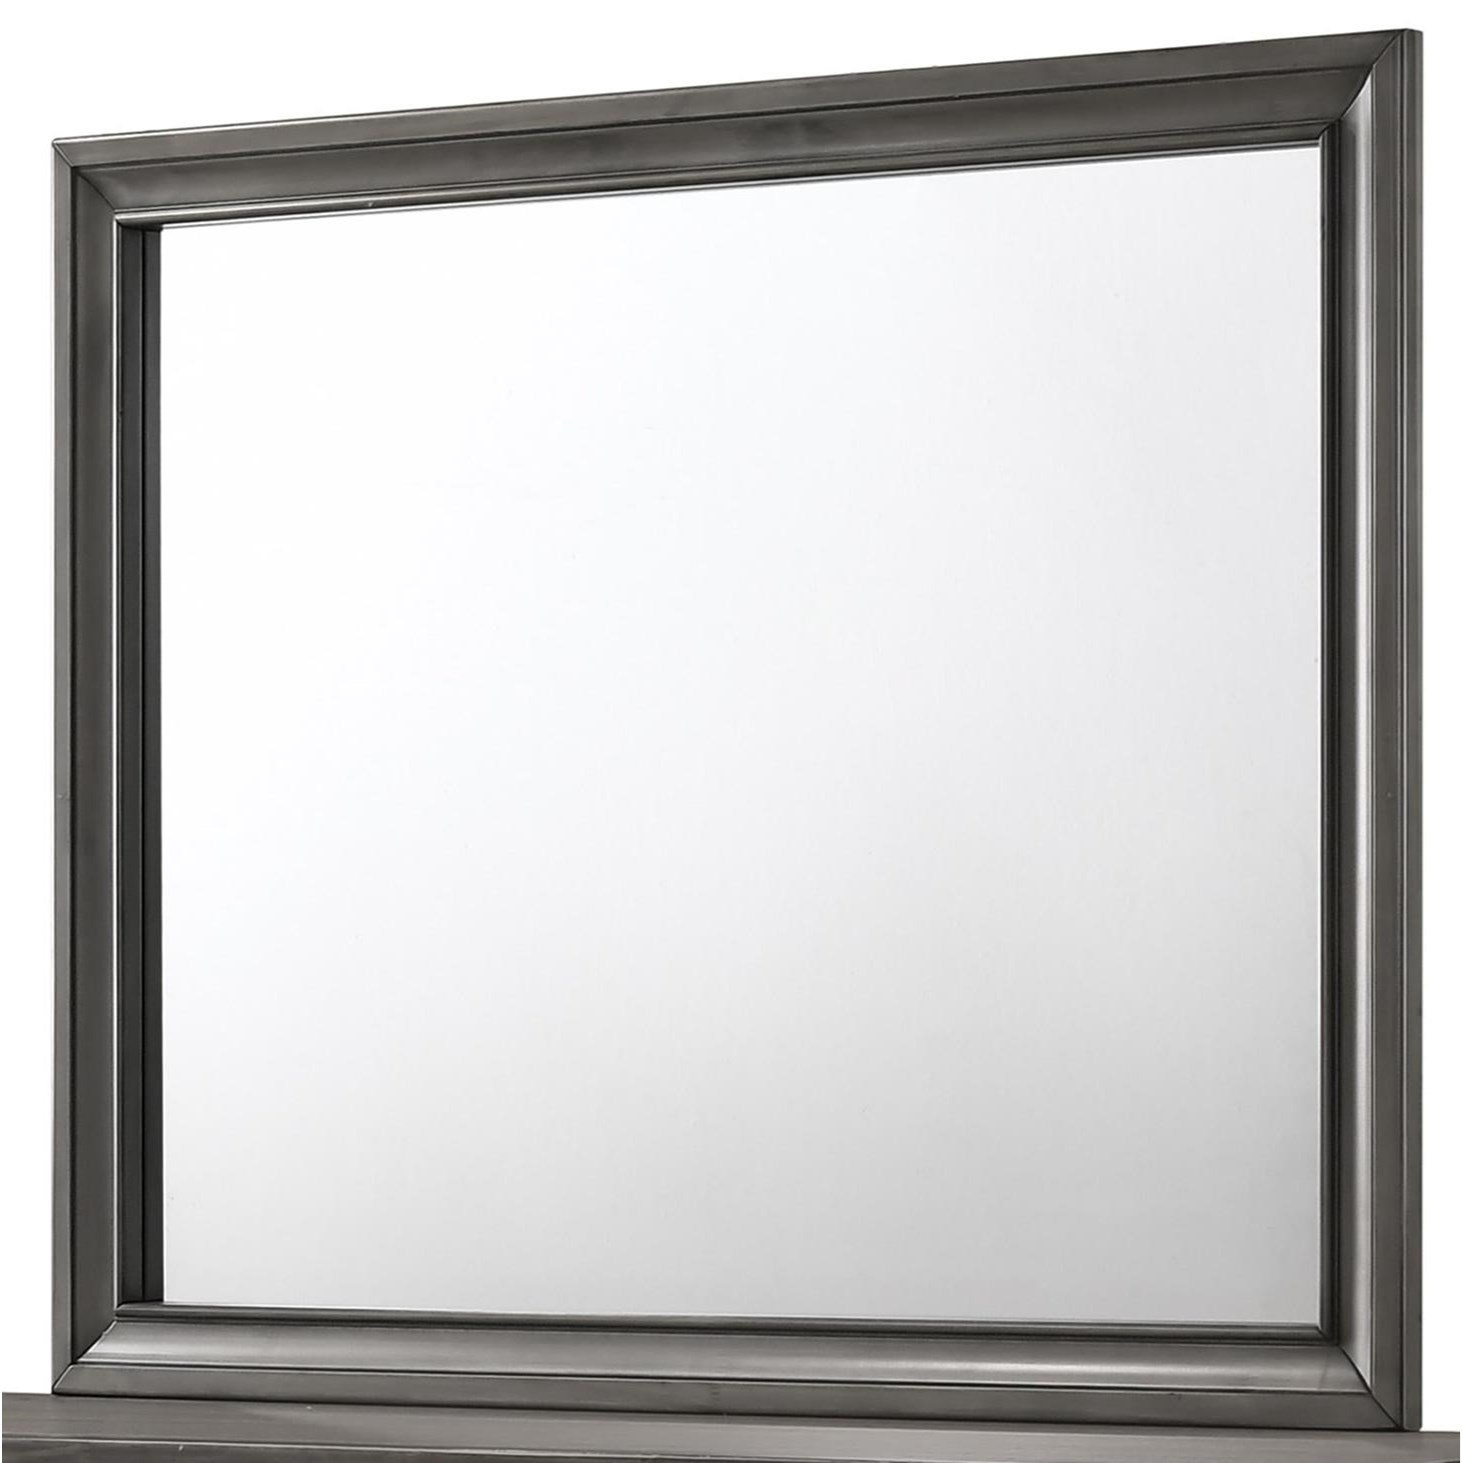 Regata Dresser Mirror by Crown Mark at Northeast Factory Direct